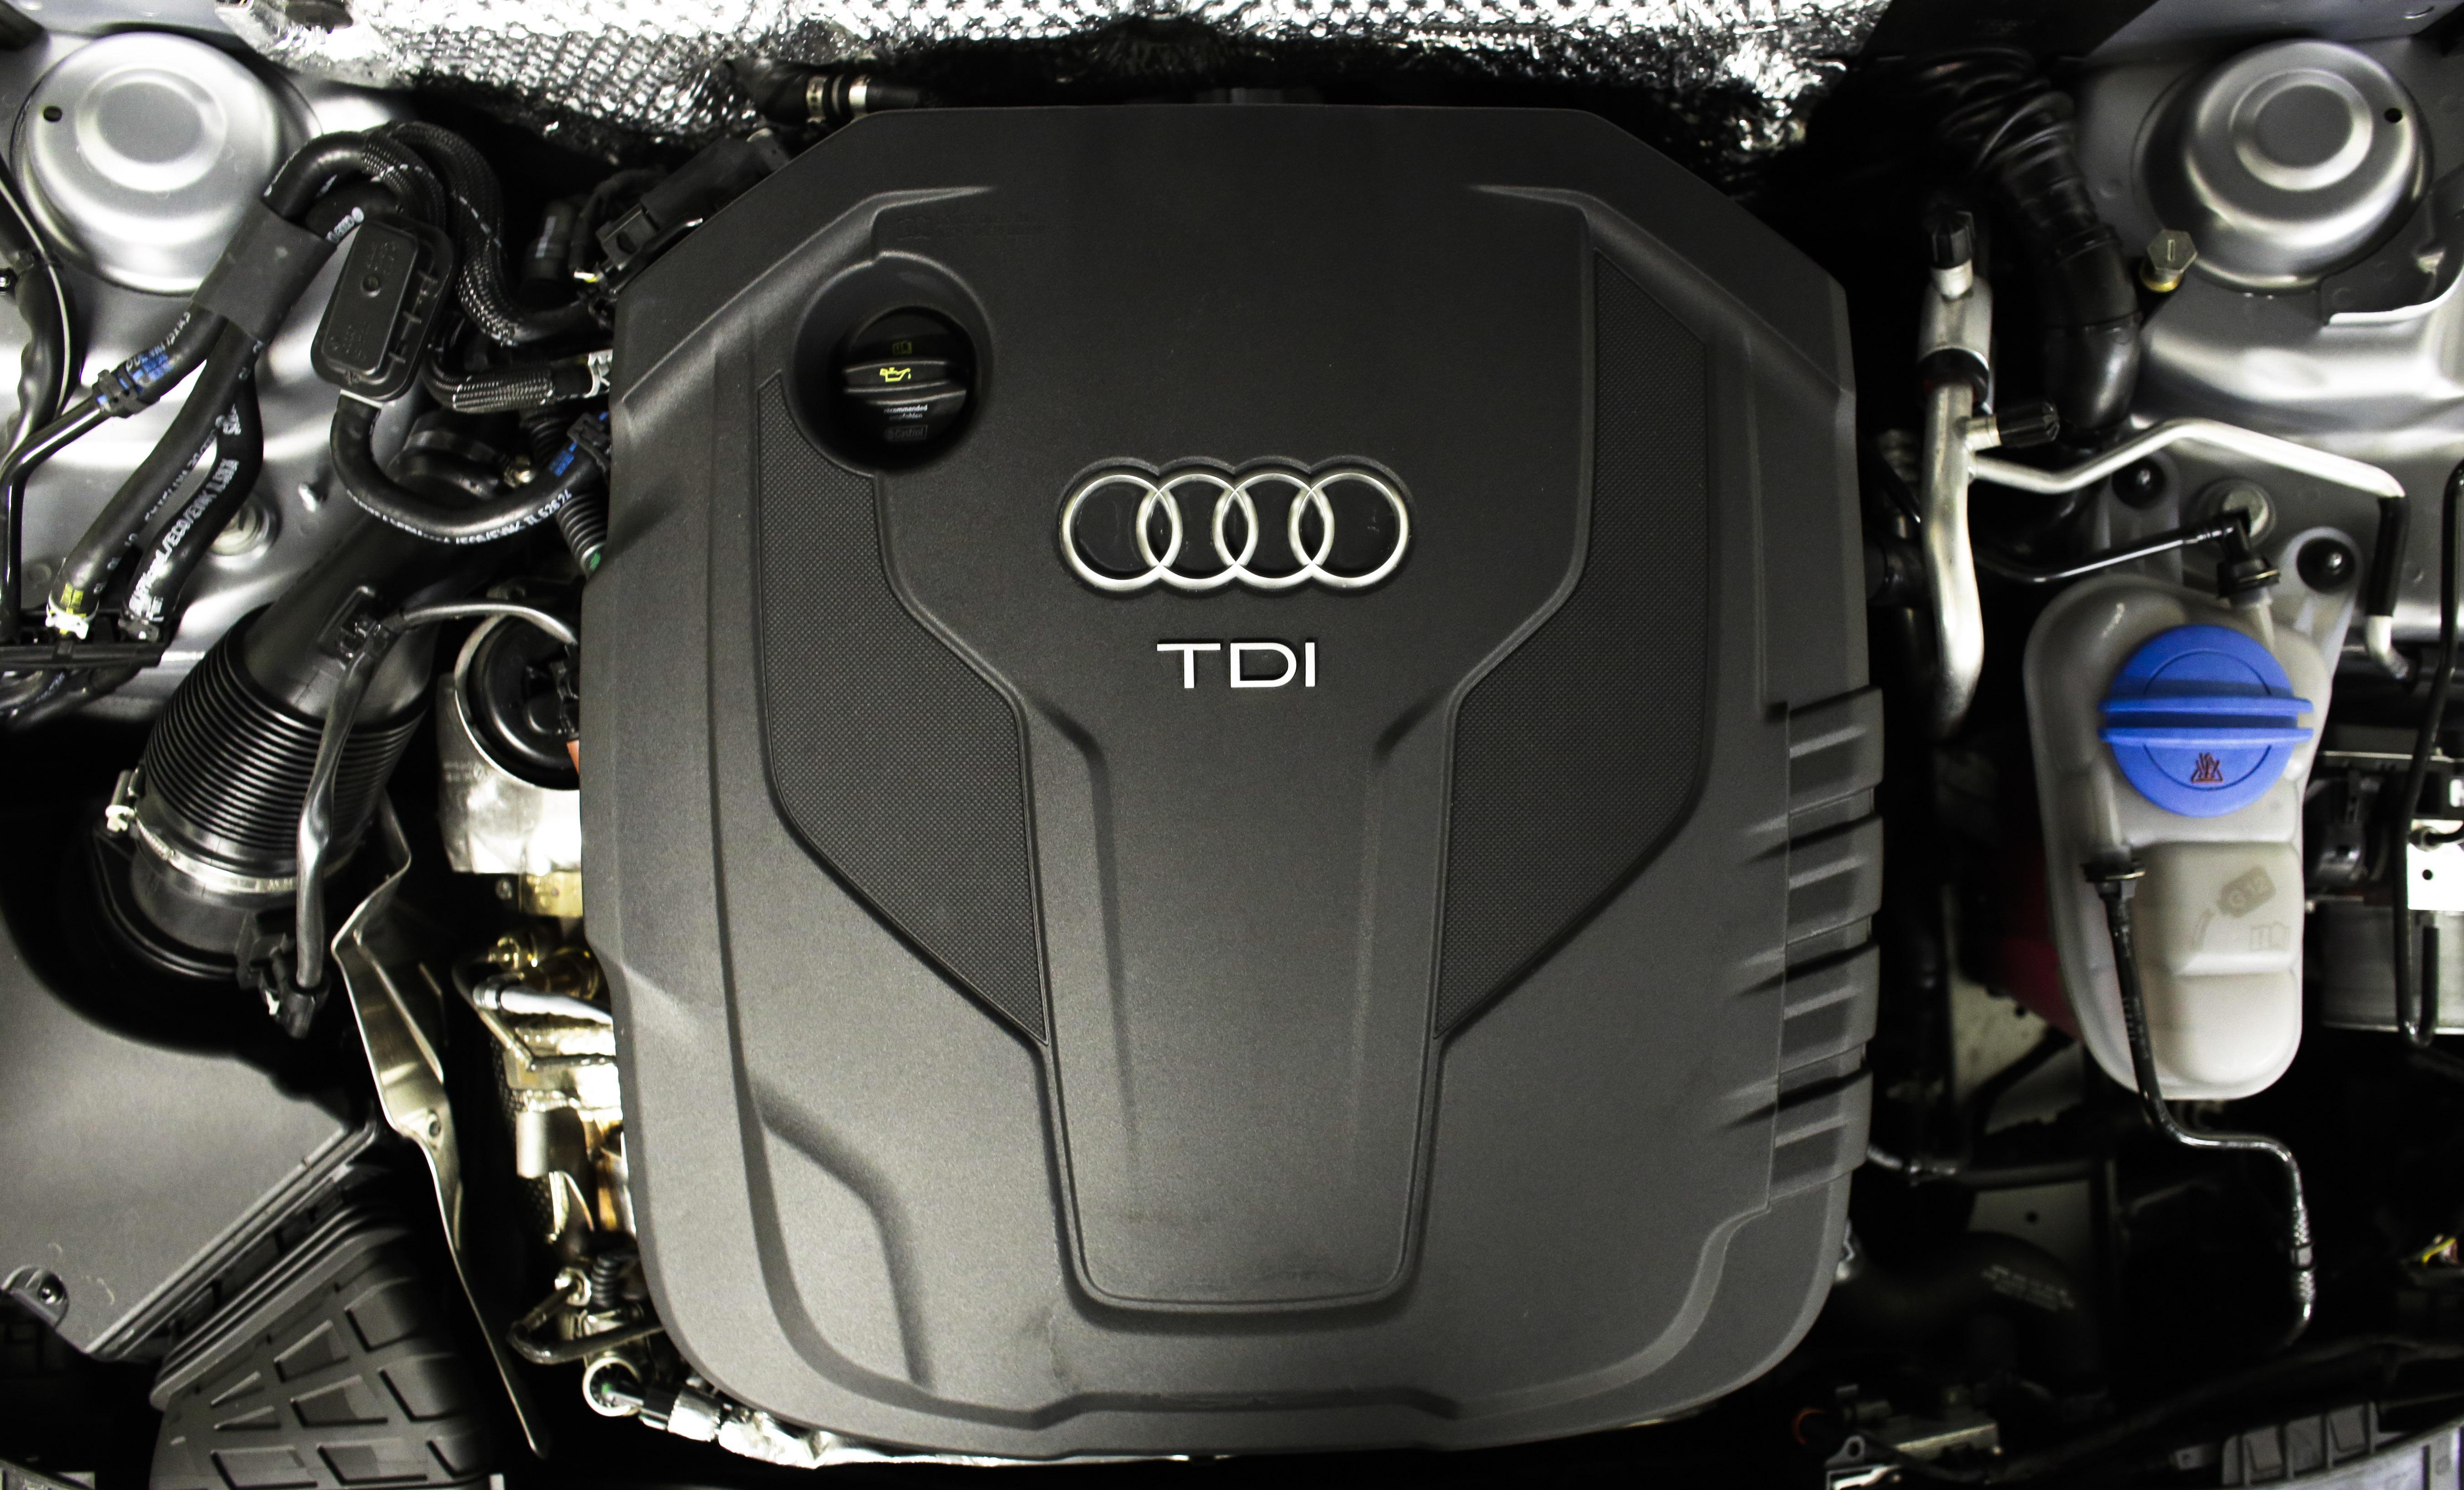 emisné testy, dieselgate, Audi